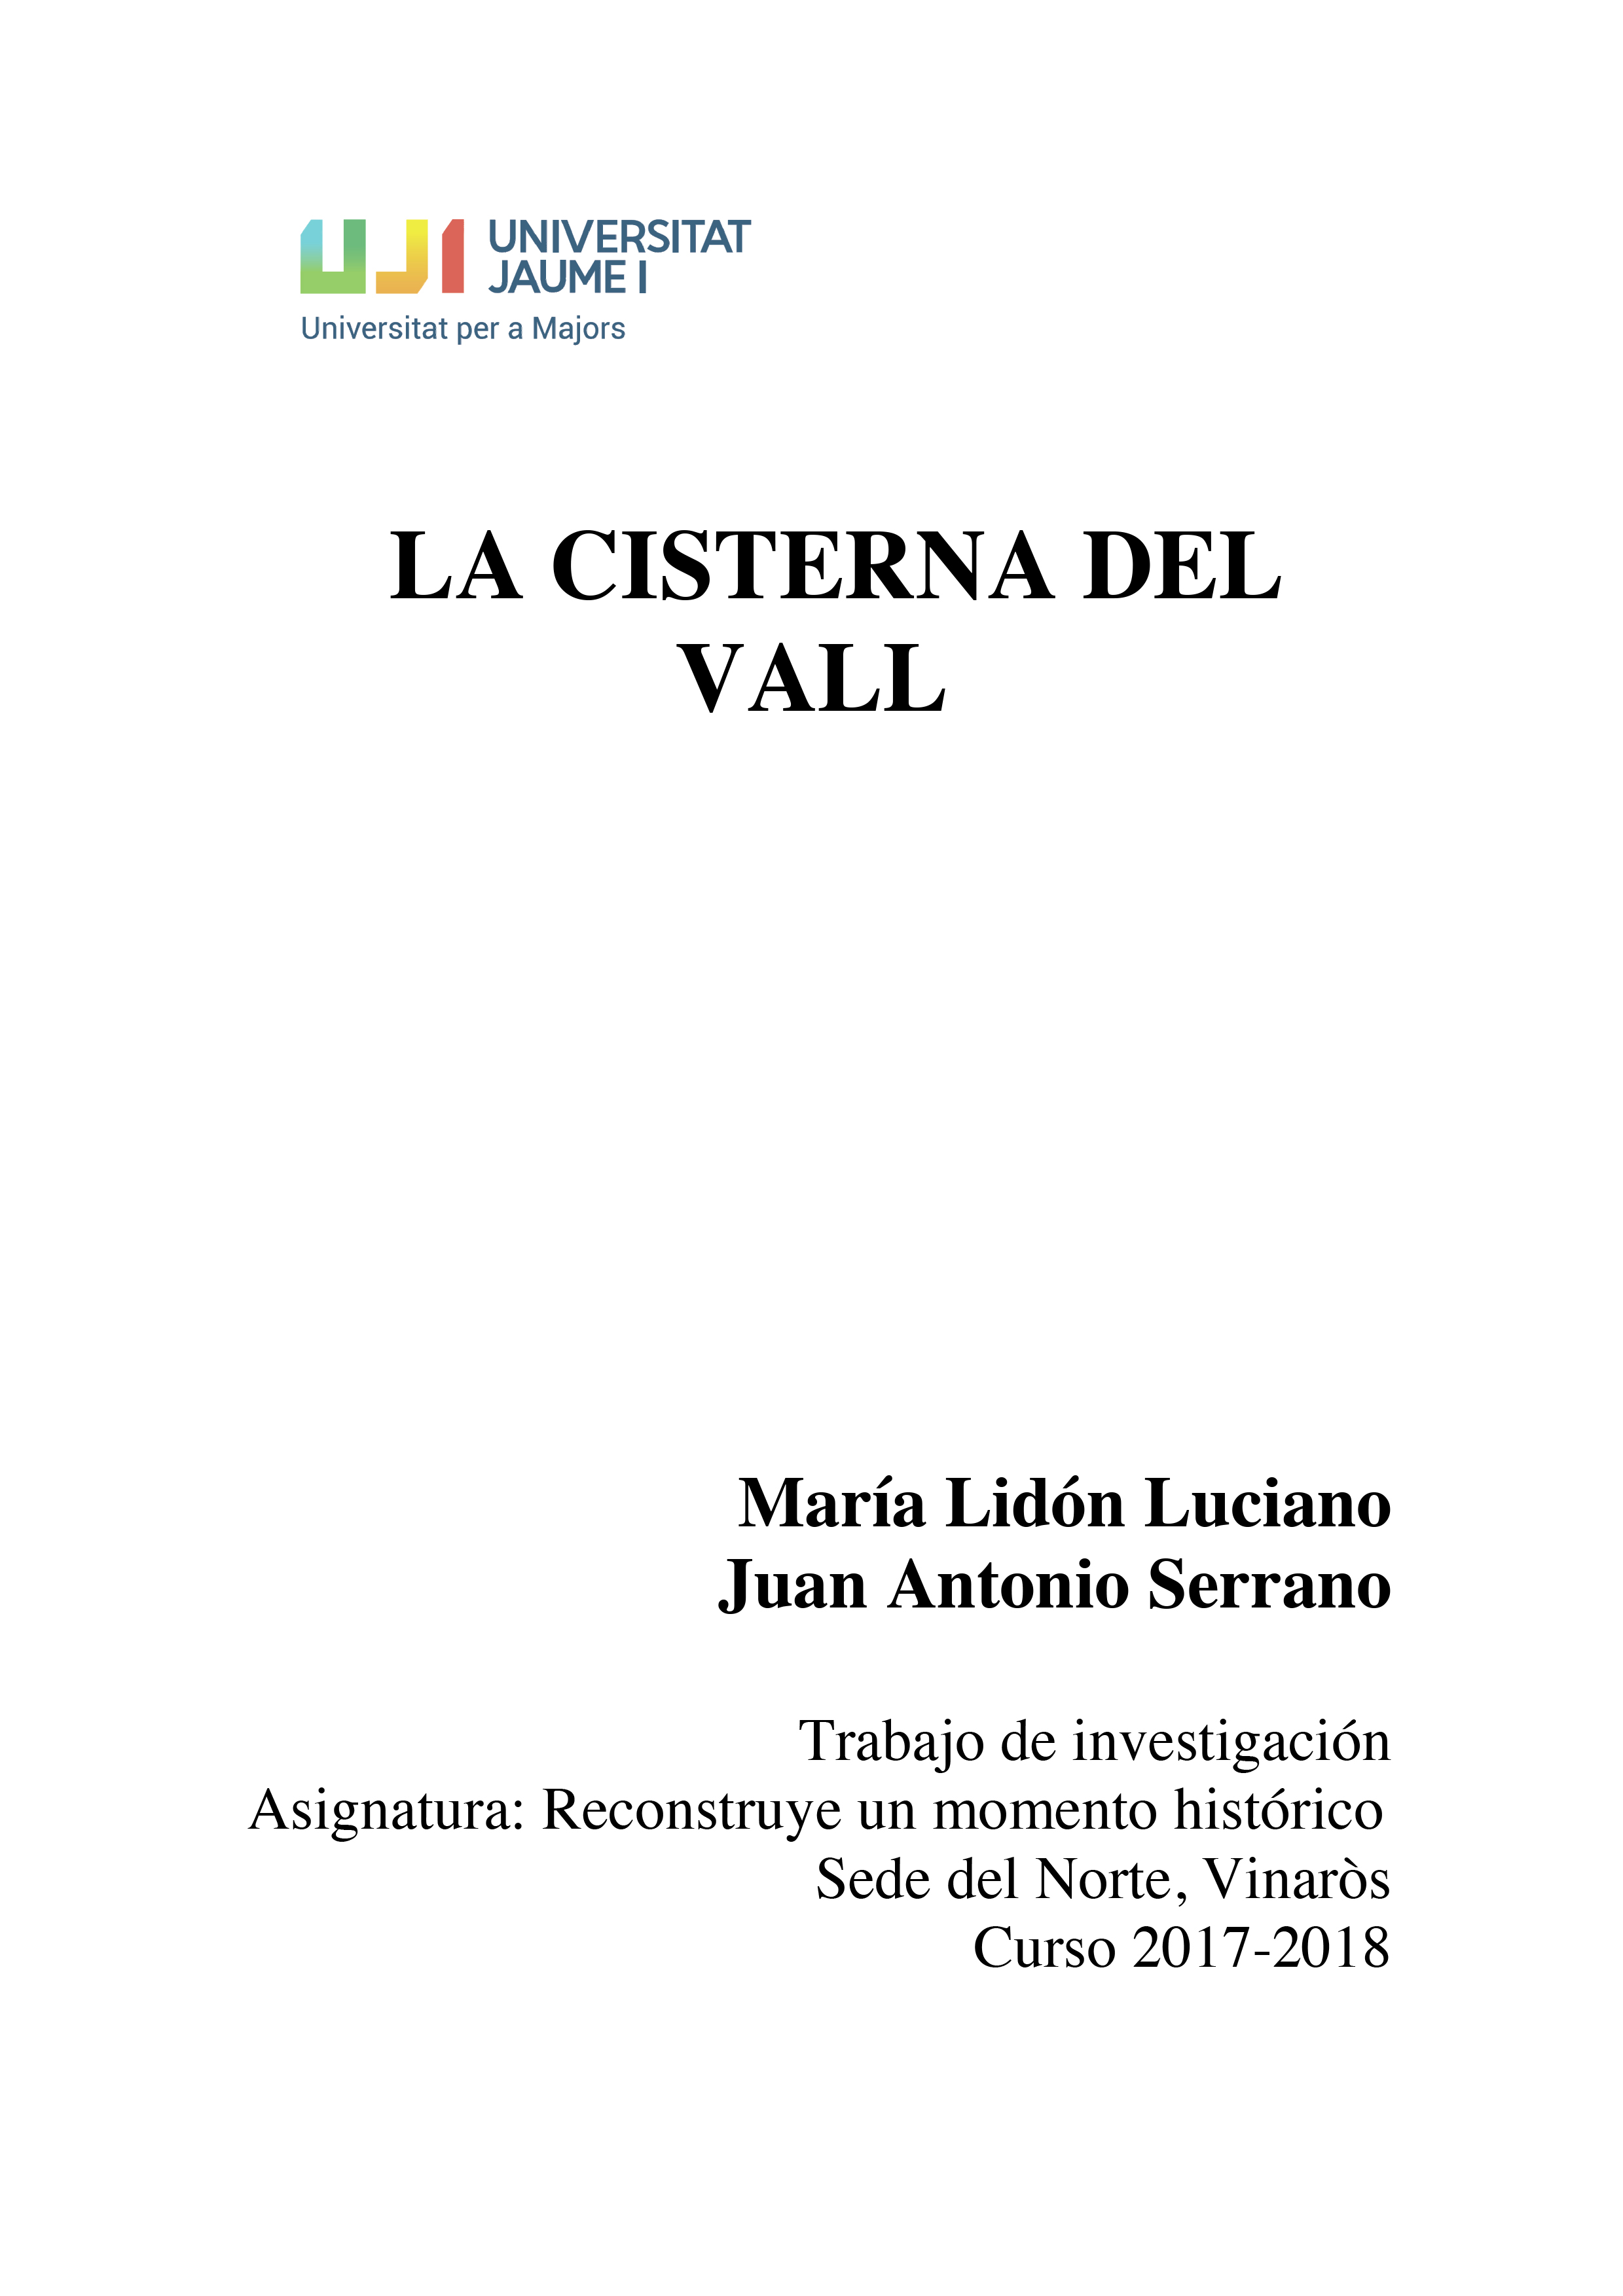 La-Cisterna-del-Vall